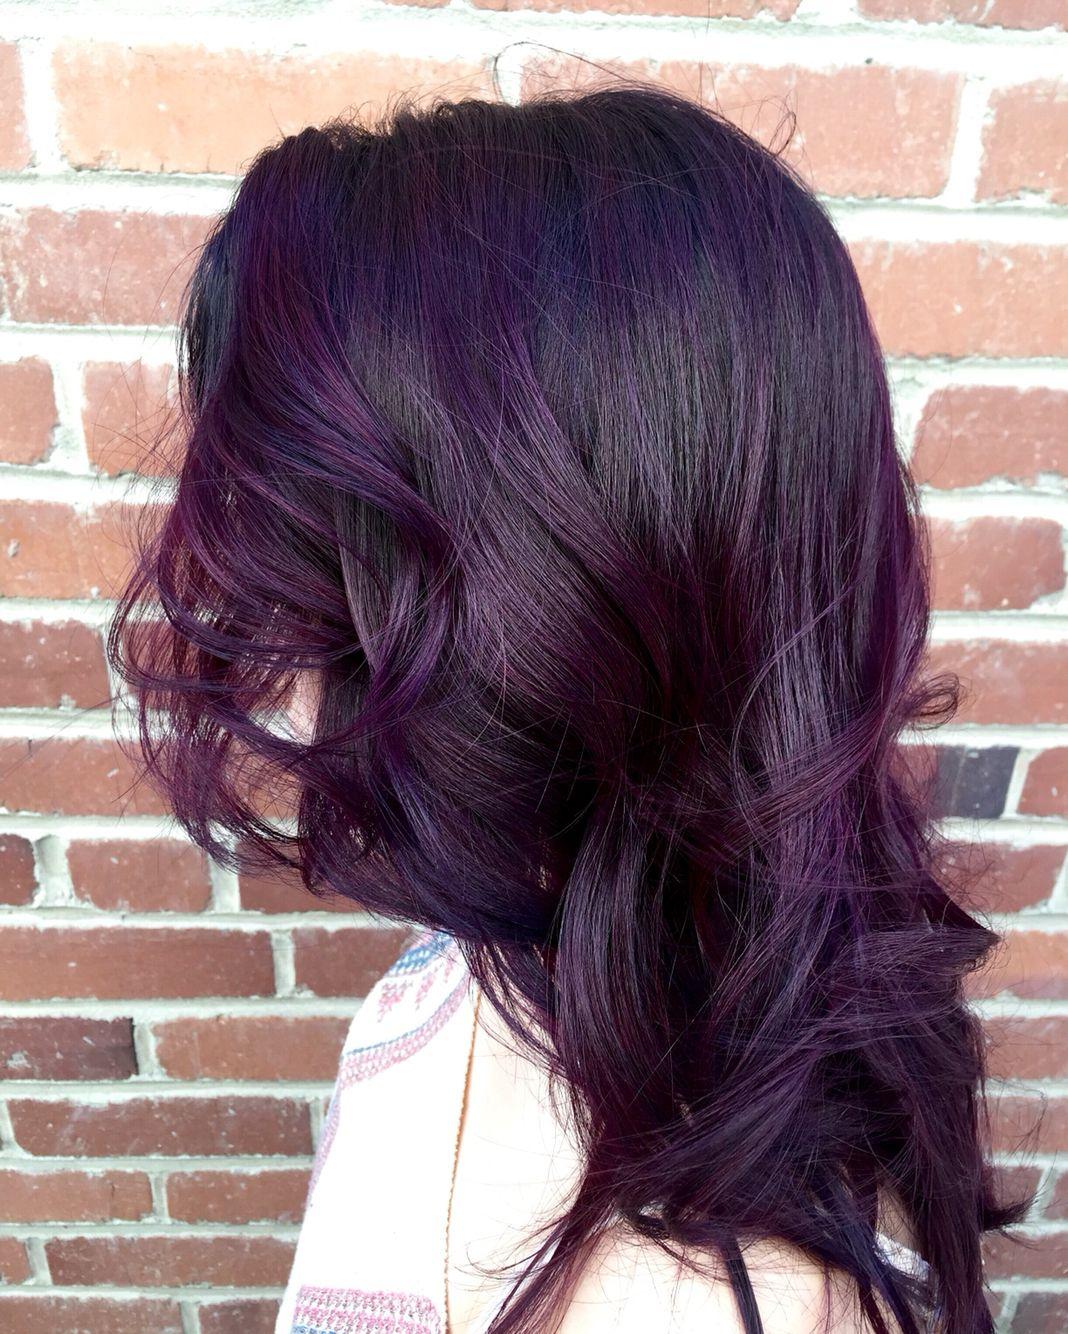 Pinterest Cvkefacee Instagram Cvkeface Dark Purple Hair Color Spring Hair Color Violet Hair Colors